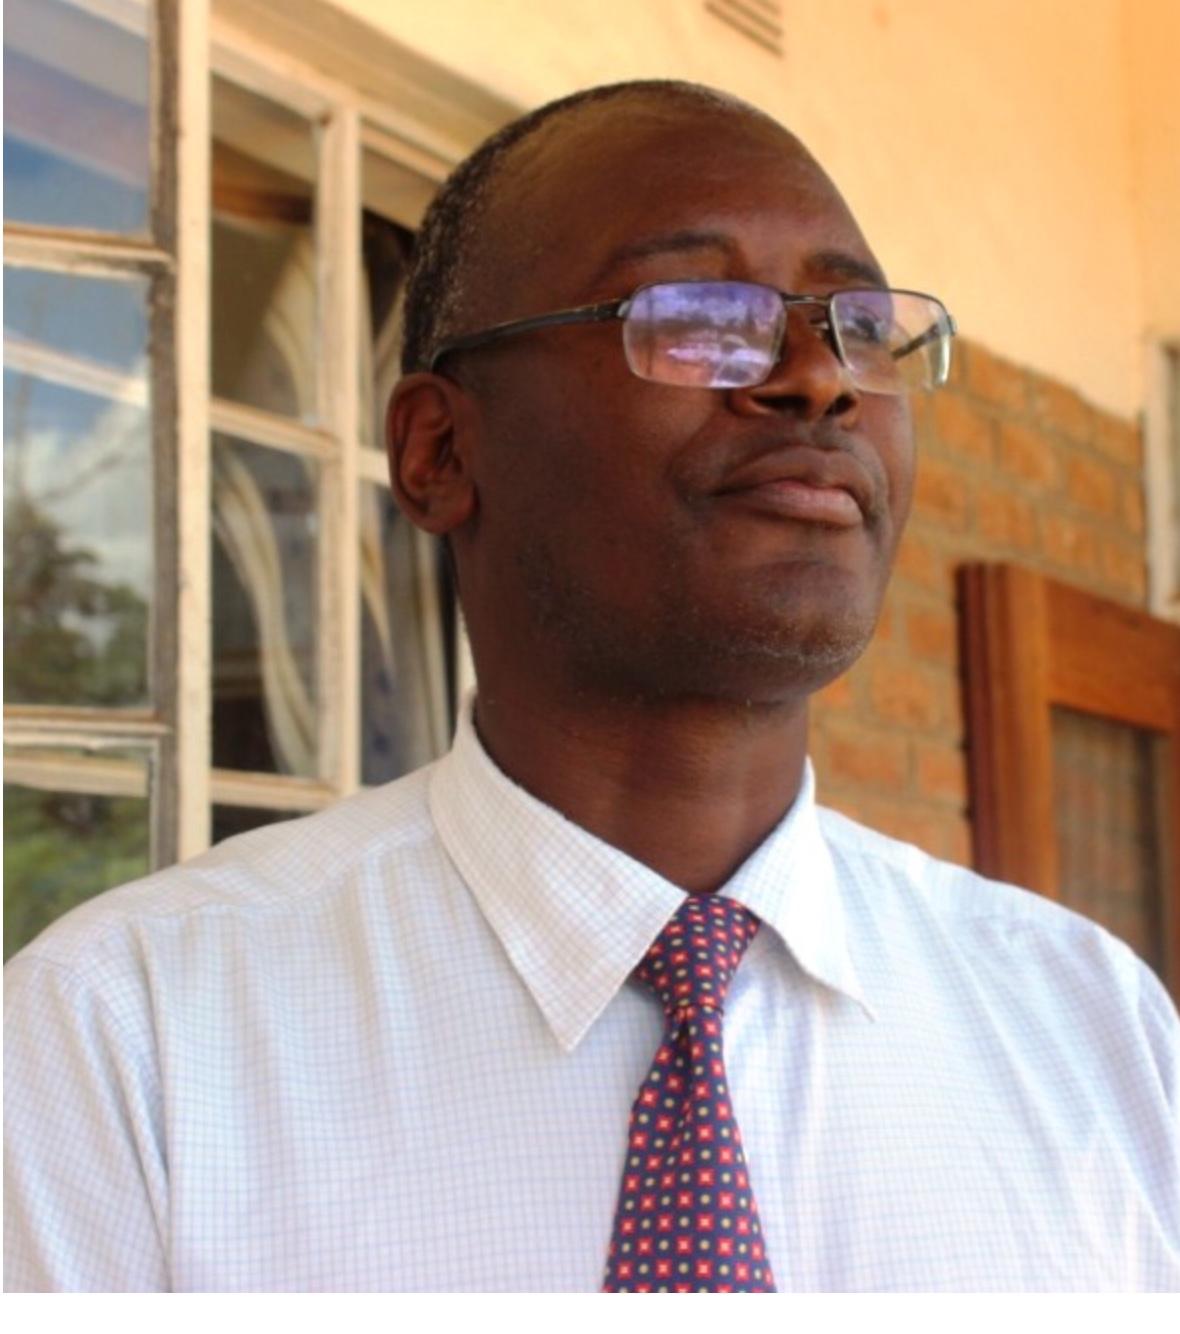 malawi chairs johannesburg desk dinosaur chair board queries mzimba ngos k11 billion programmes